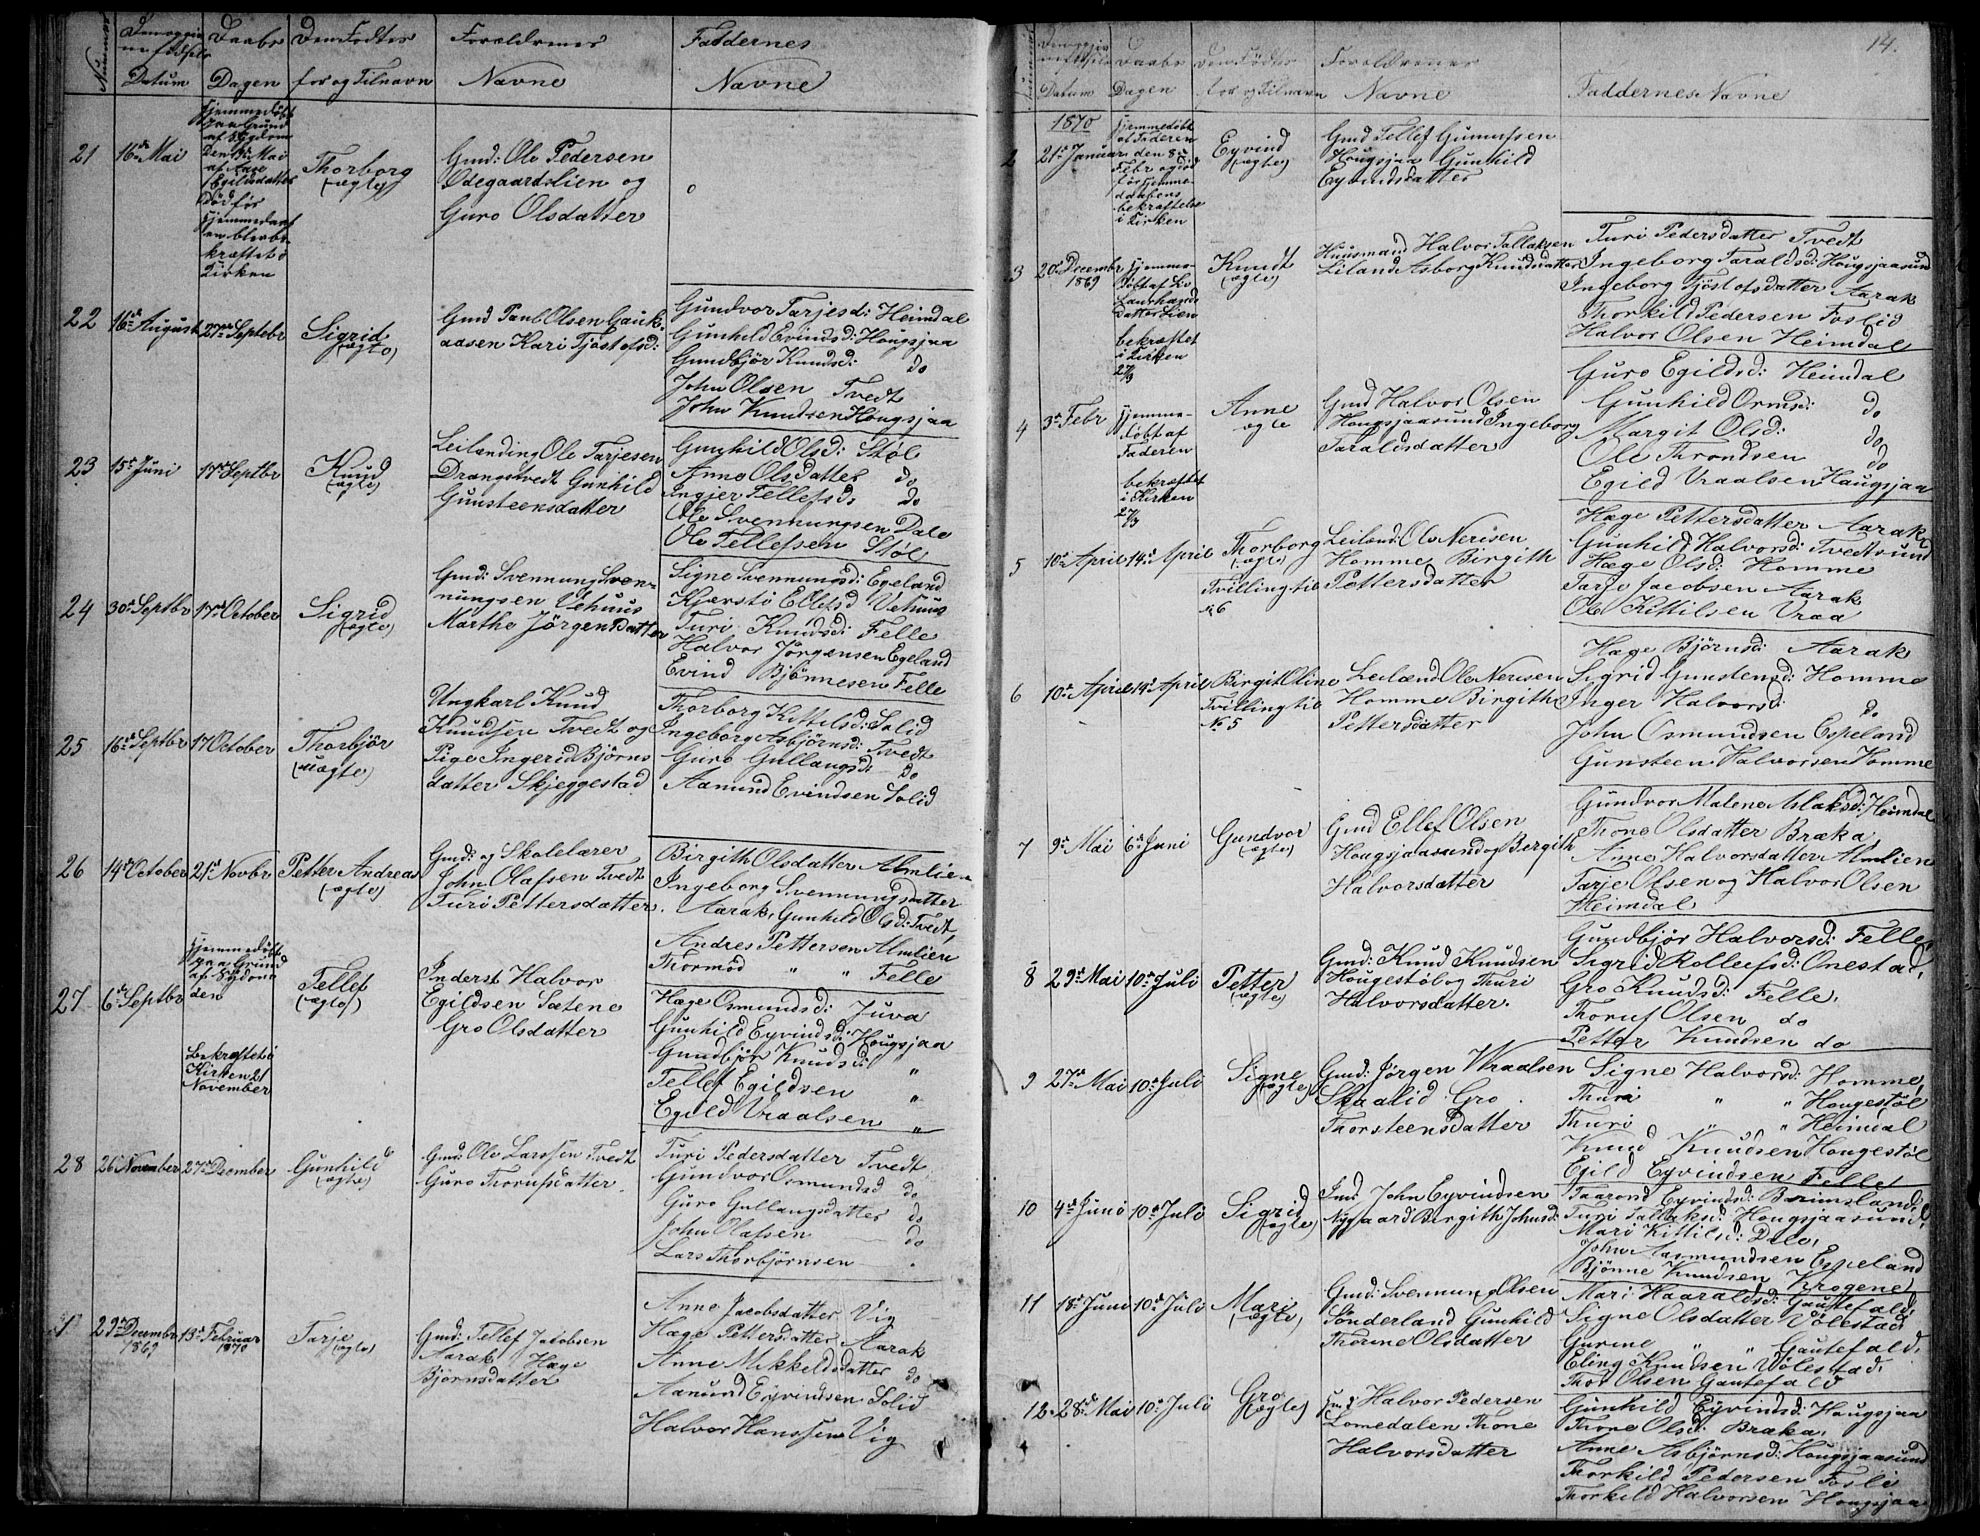 SAKO, Nissedal kirkebøker, G/Gb/L0002: Klokkerbok nr. II 2, 1863-1892, s. 14